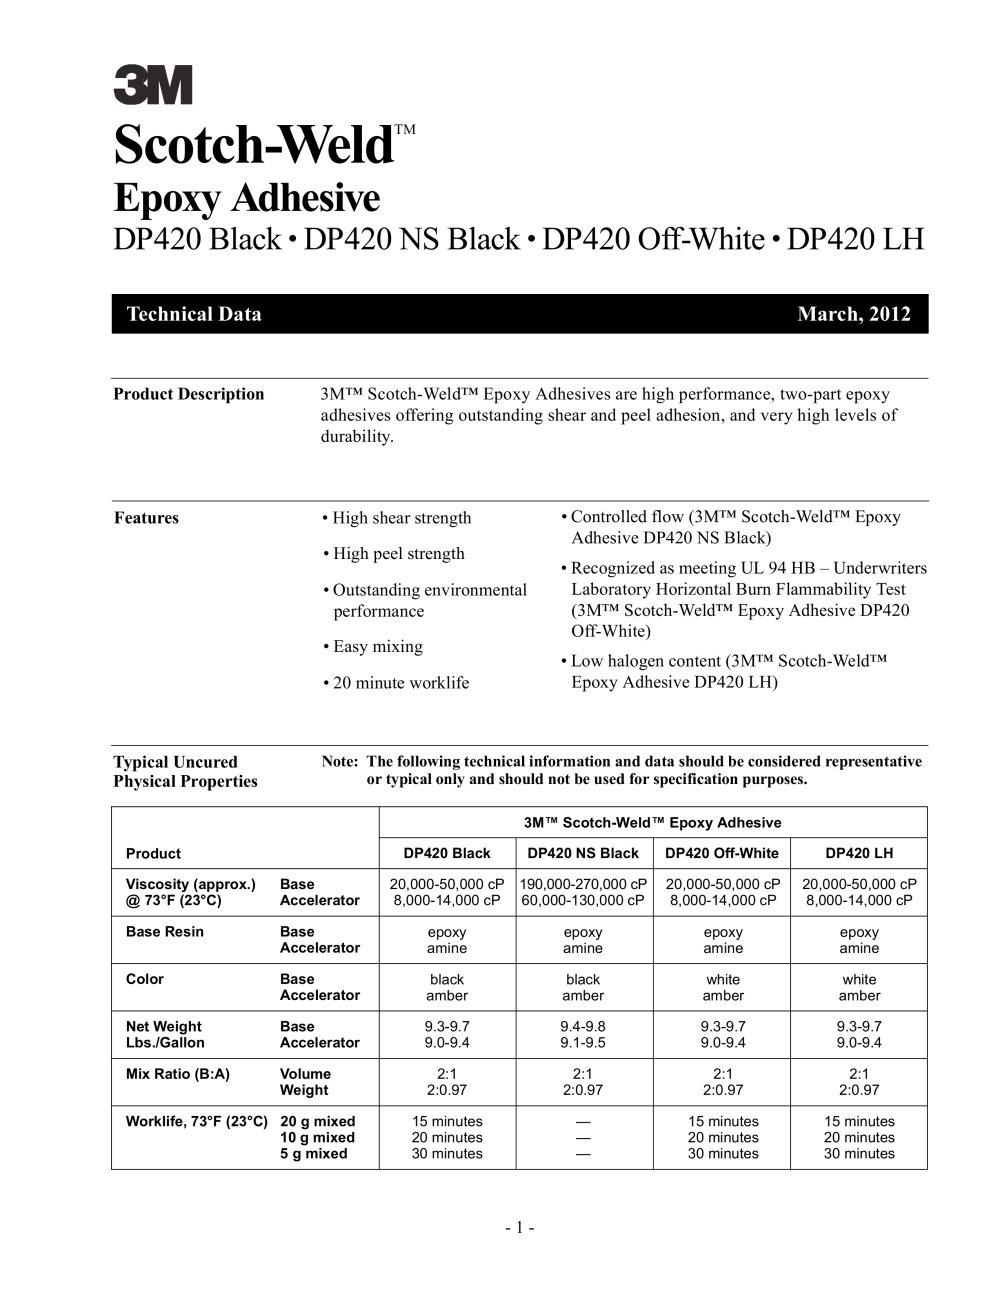 3m™ scotch-weld™ epoxy adhesive dp420 black, 37 ml, 12 per case.